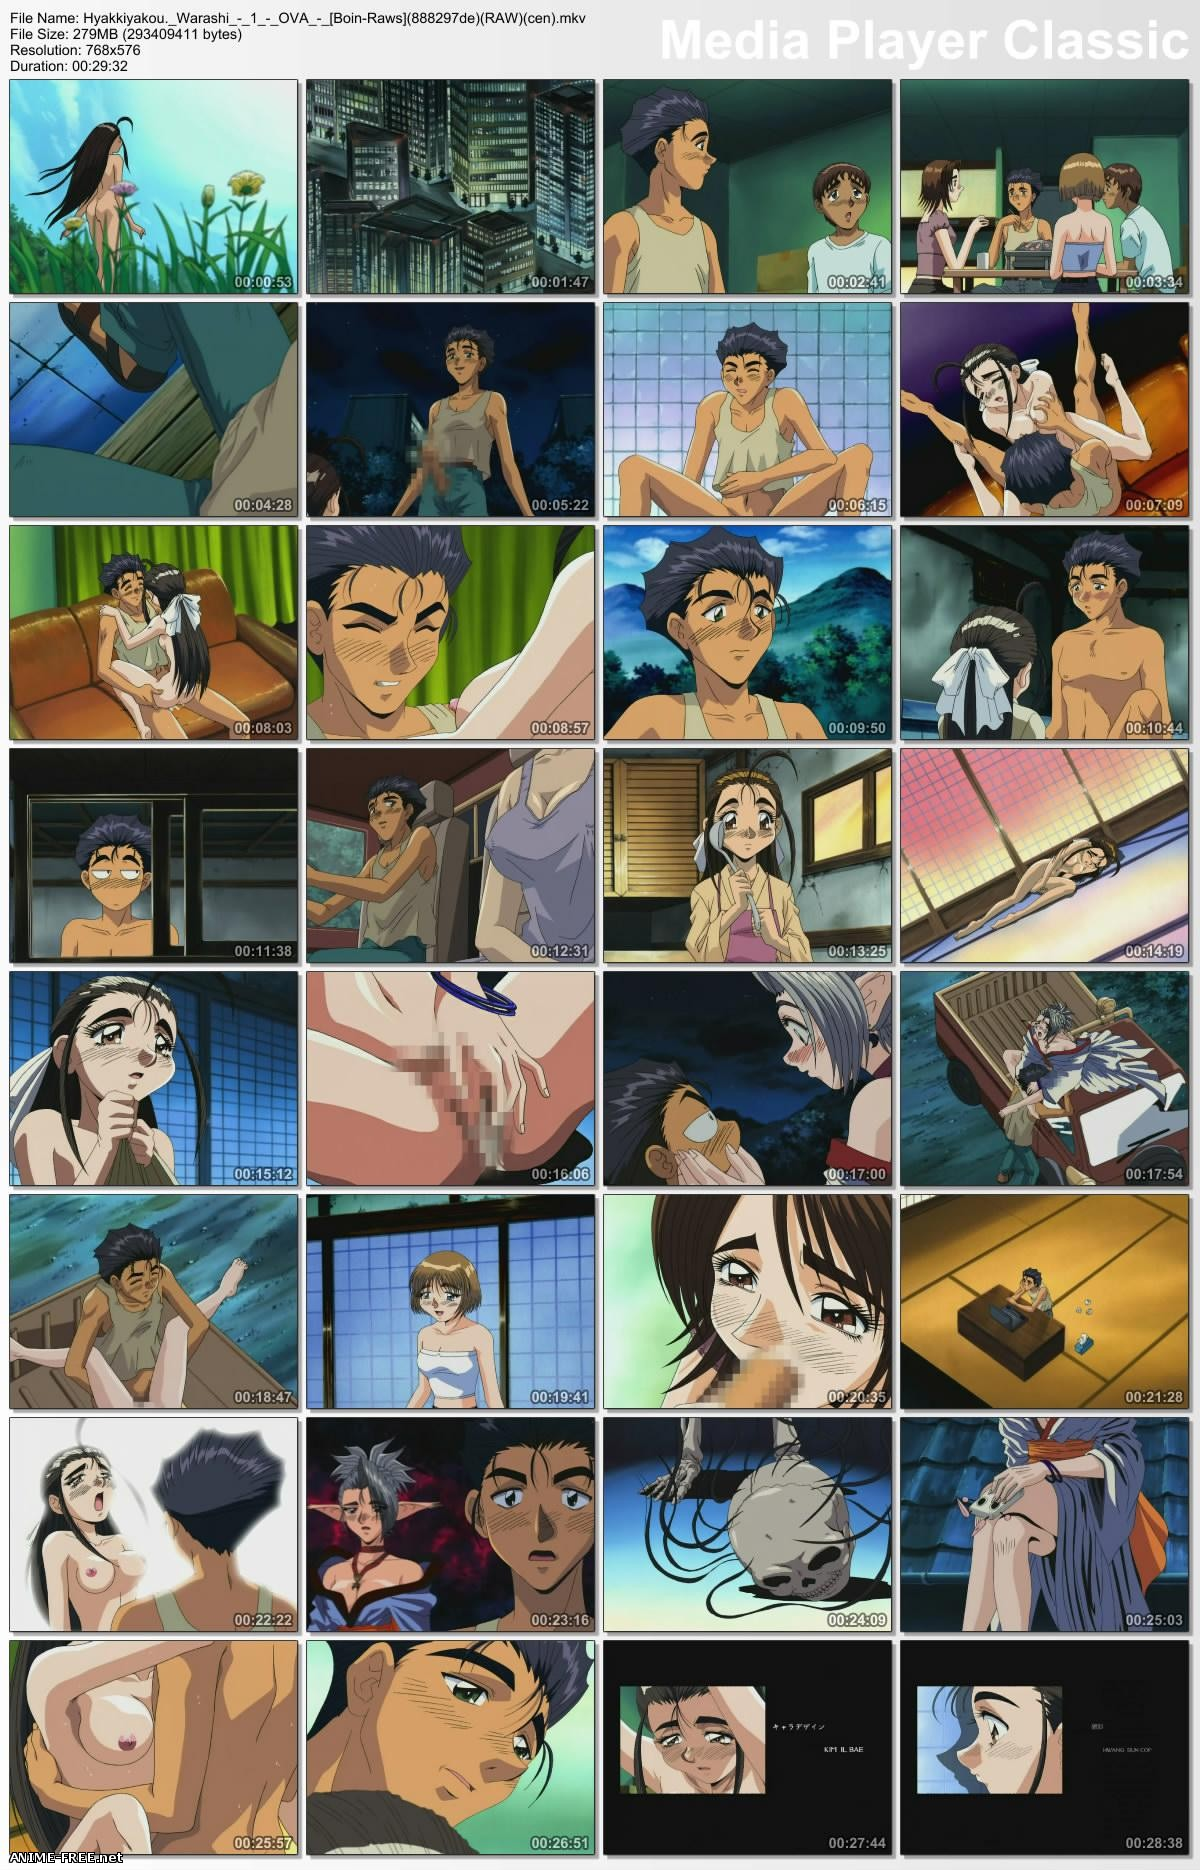 Hyakkiyakou: Warashi / Хяккияко: Вараши [Ep.1] [RUS,JAP,KOR] Anime Hentai